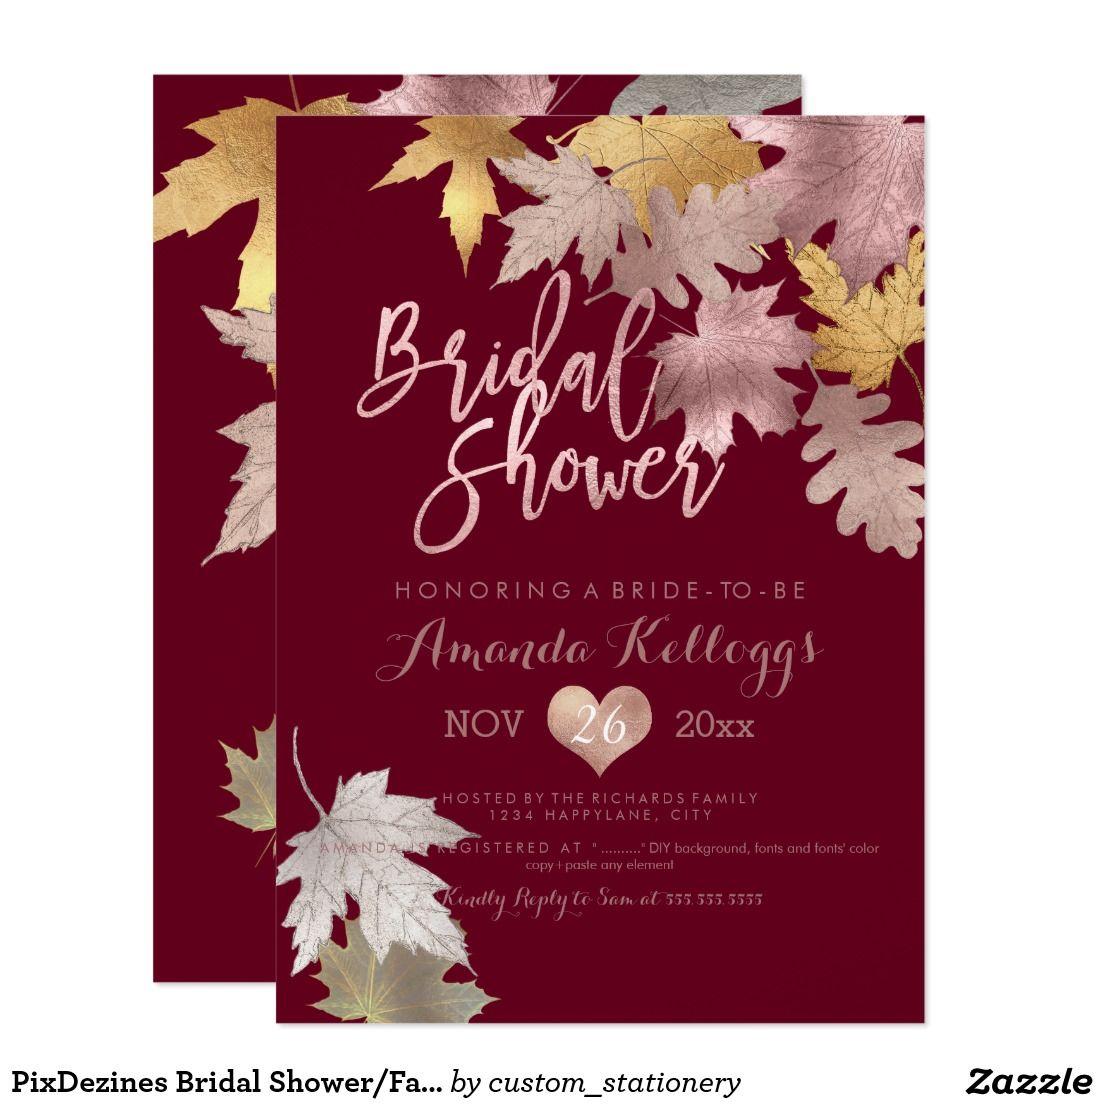 PixDezines Bridal Shower/Fall/Faux Foil | Rose Gold Trends ...